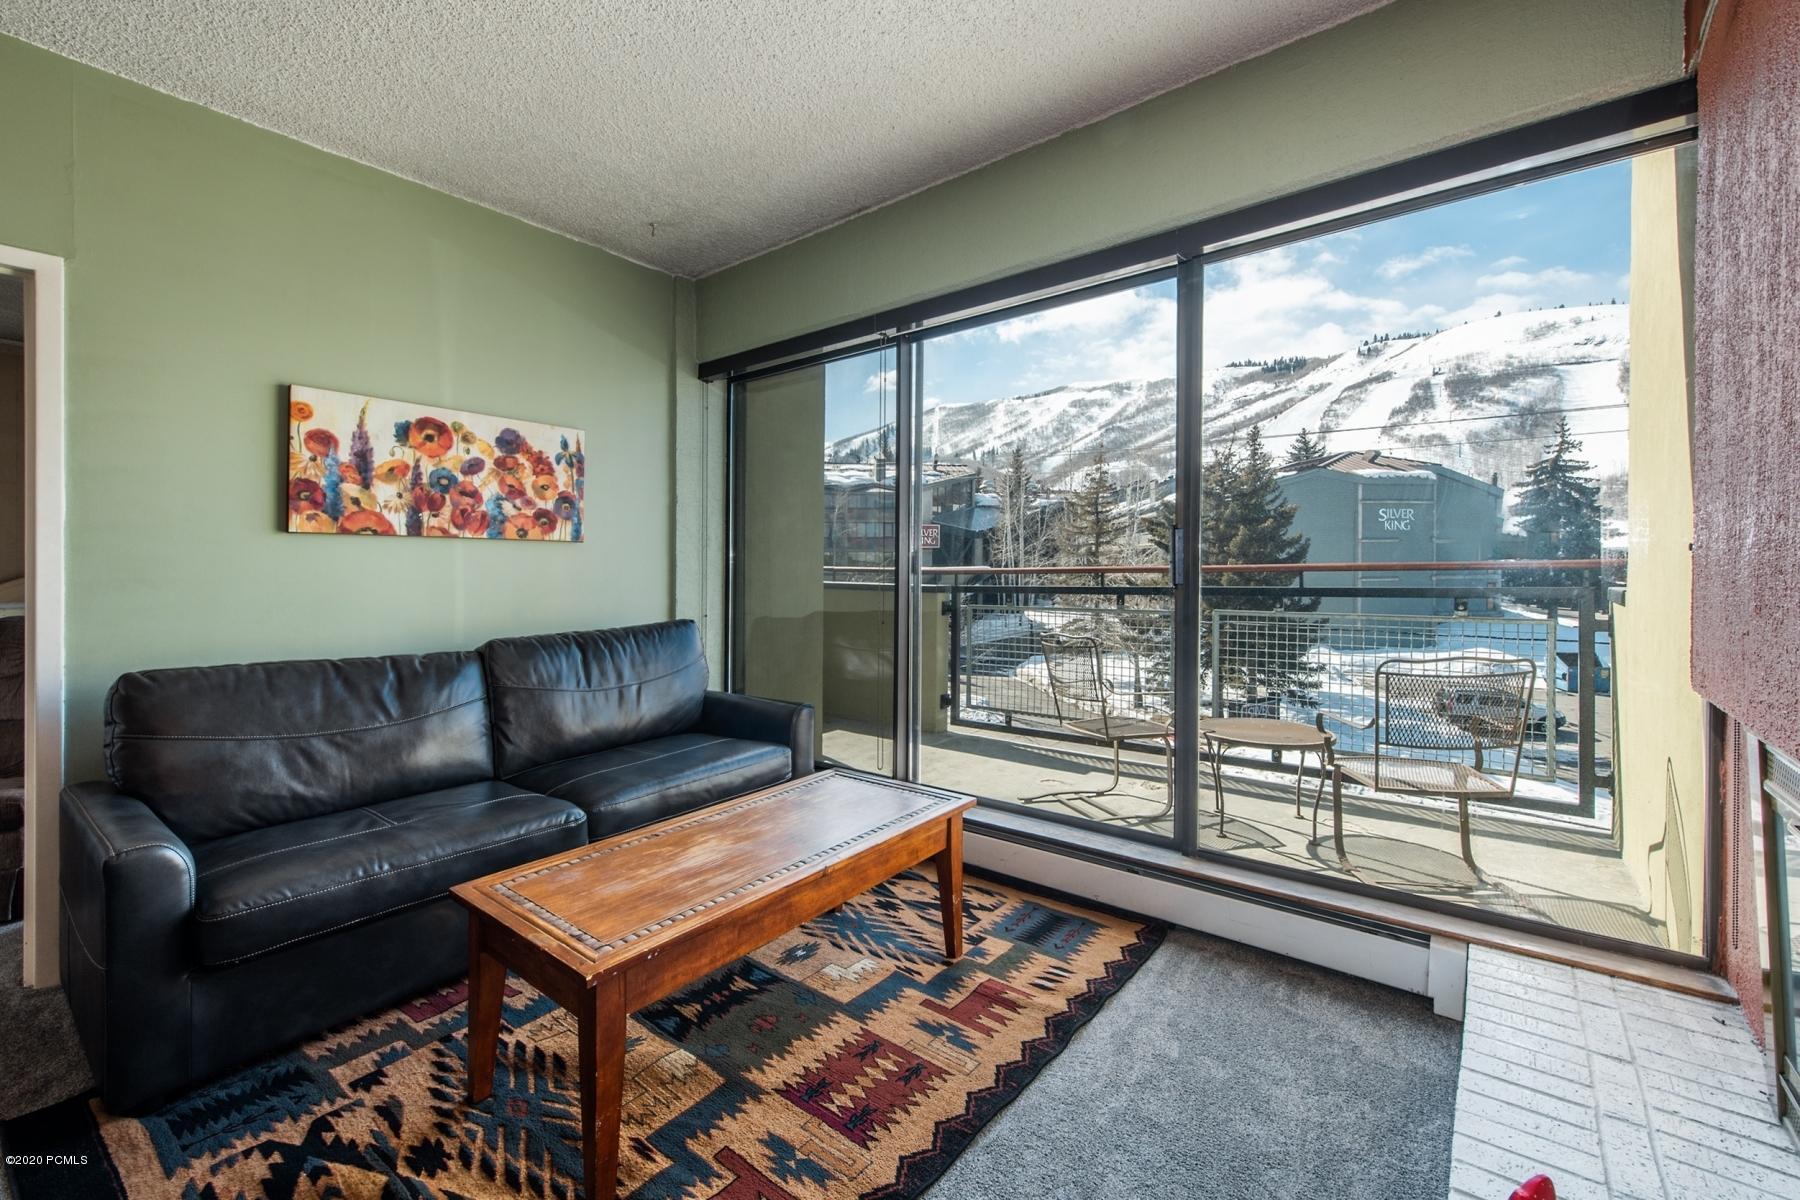 1482 Empire Avenue, Park City, Utah 84060, 2 Bedrooms Bedrooms, ,2 BathroomsBathrooms,Condominium,For Sale,Empire,20190109112430415765000000